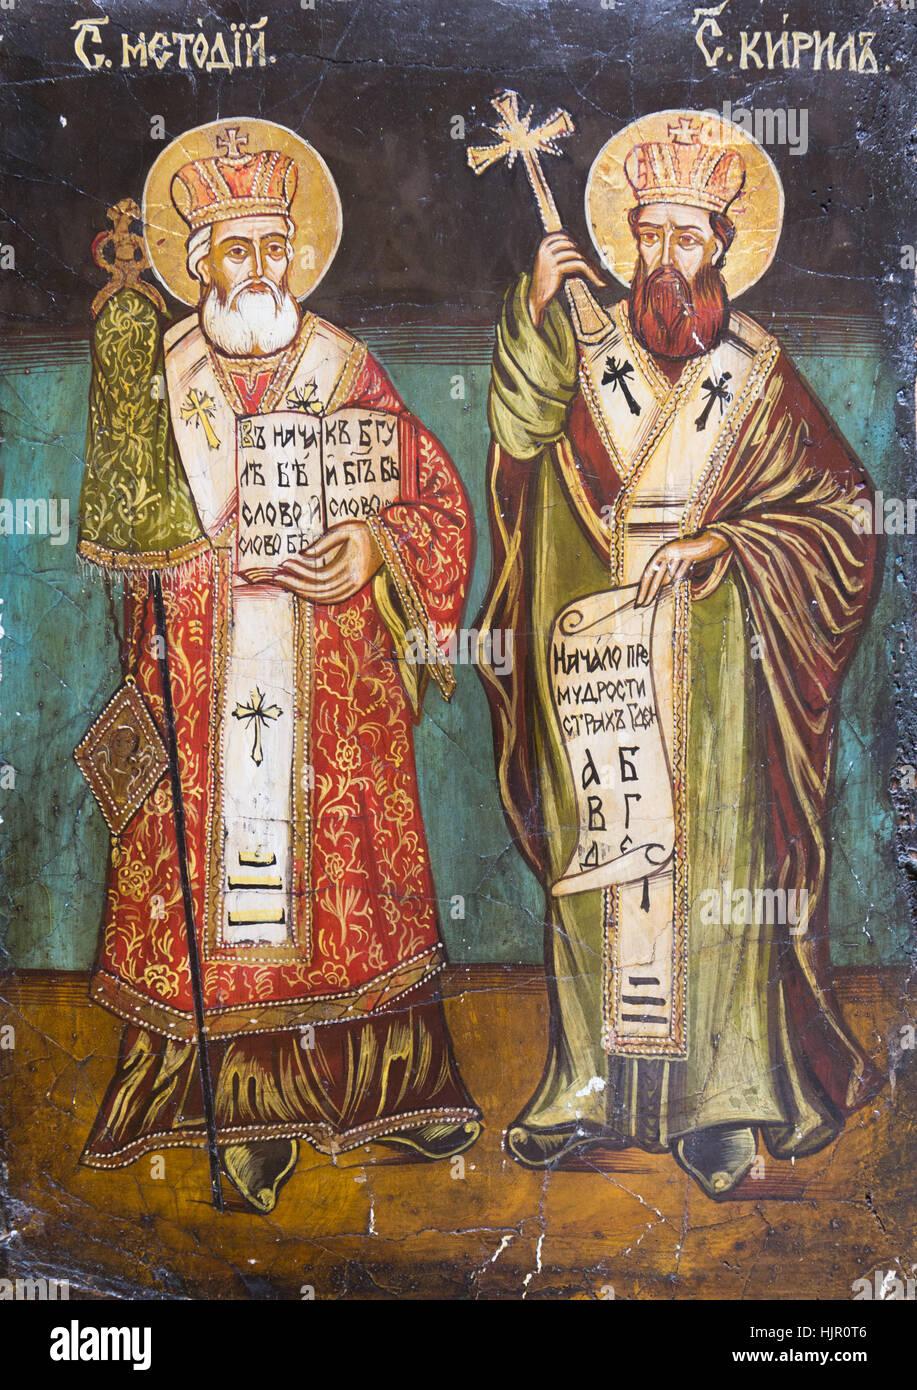 Bratislava, Slovakia, 2017/01/23. Byzantine icon of Saints Cyril and Methodius, the two brothers who were Byzantine - Stock Image